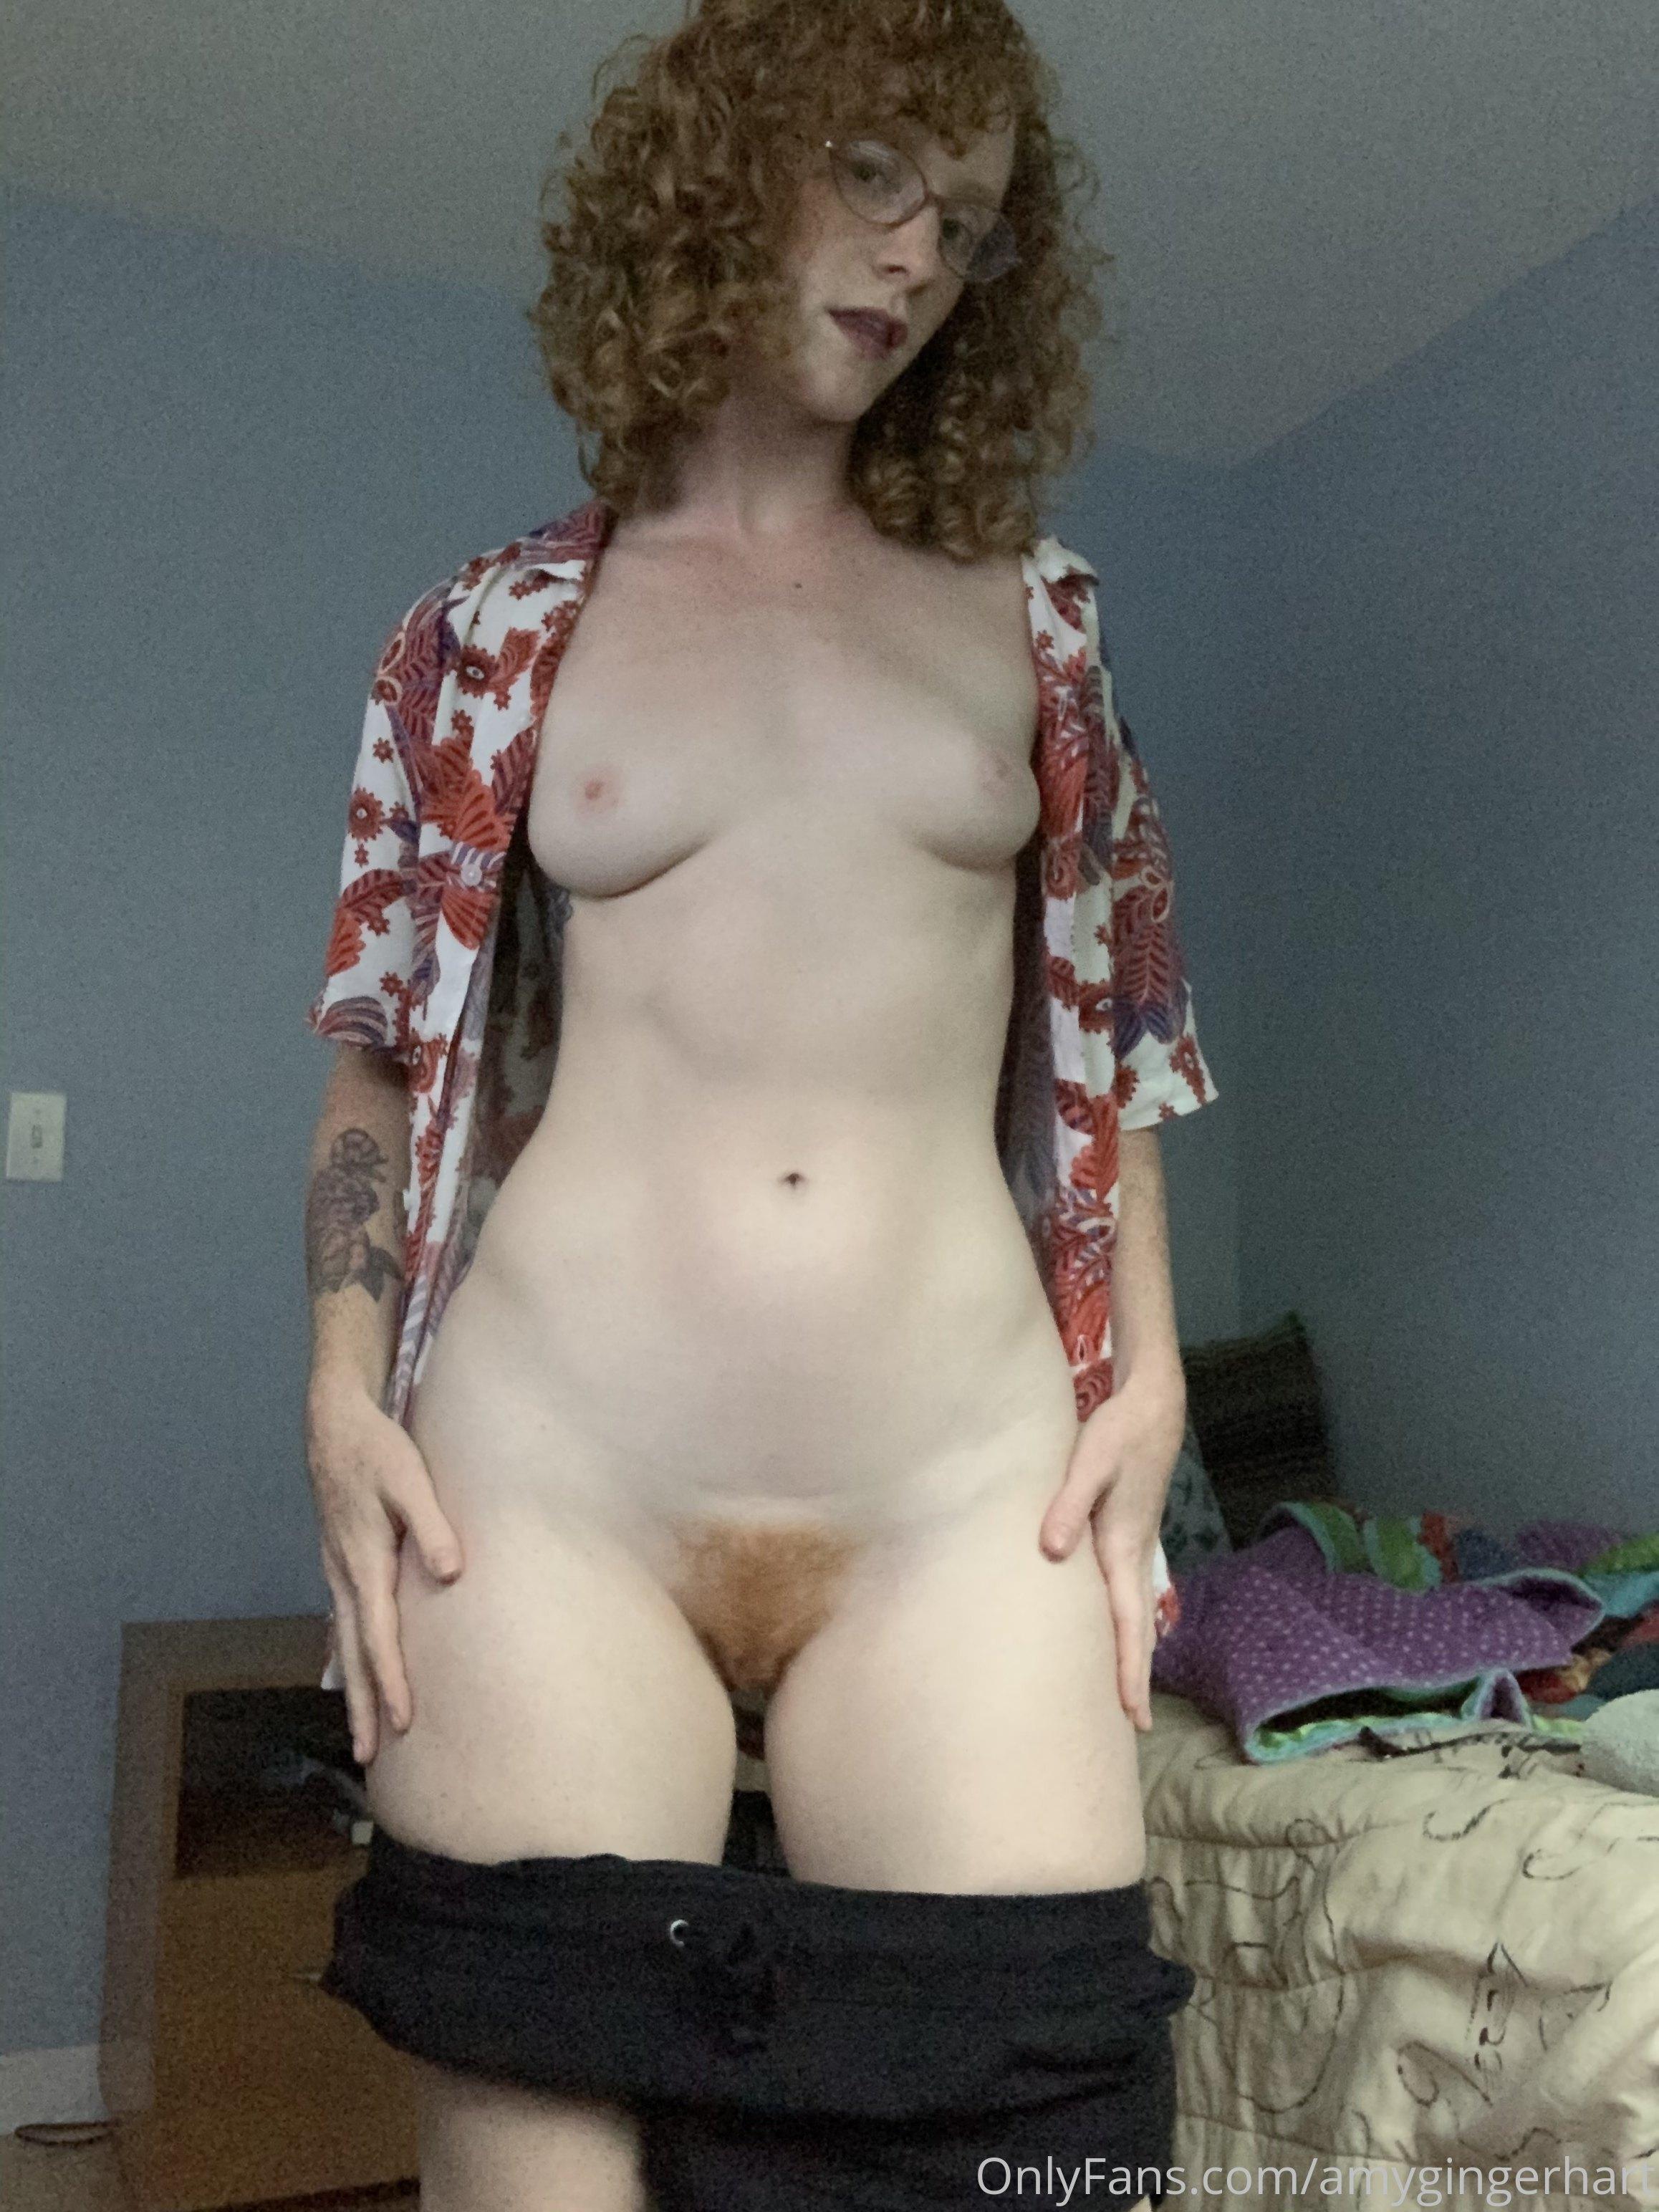 Amy Hart, Amygingerhart, Onlyfans 0315